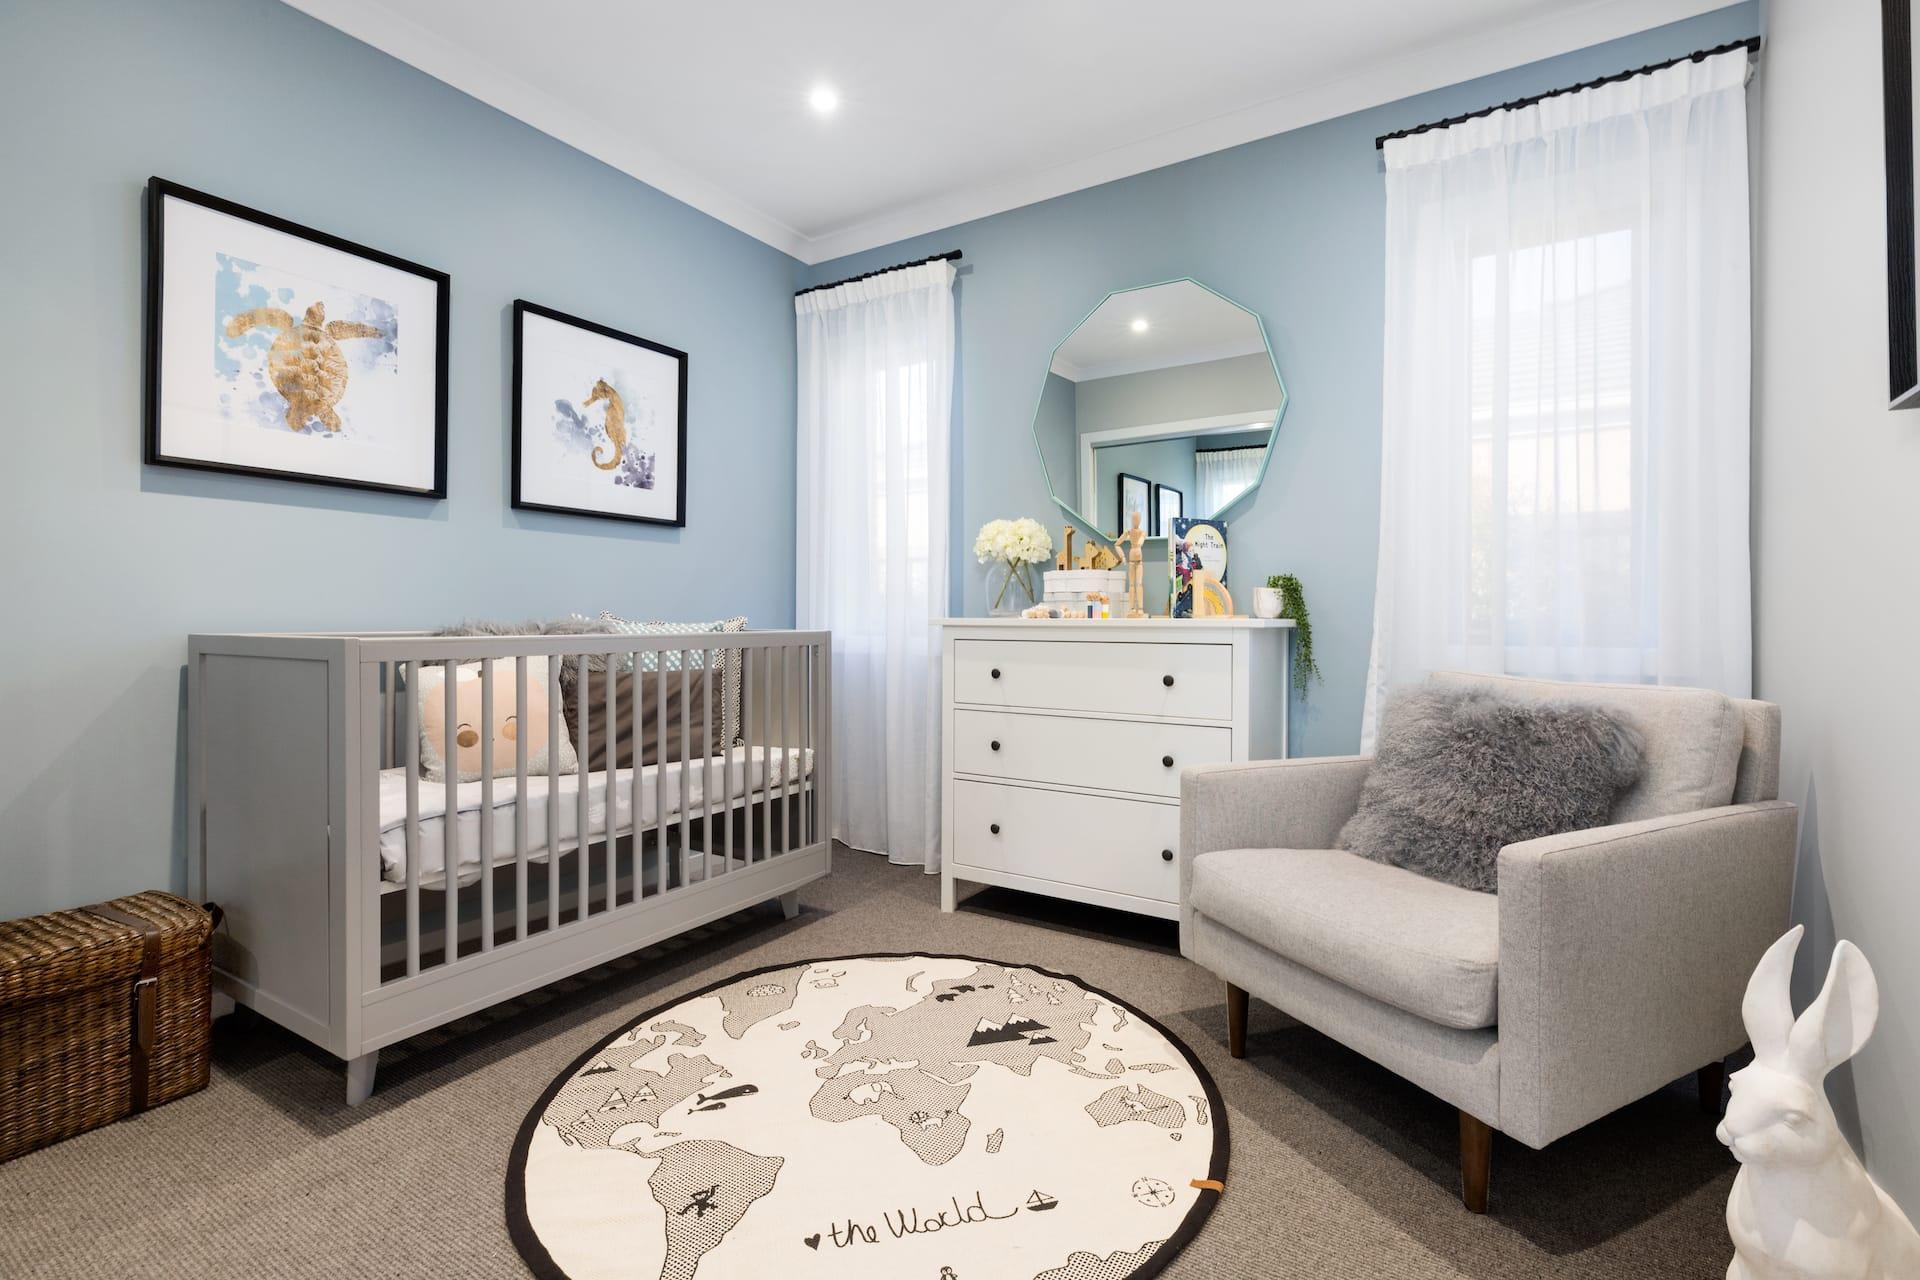 gender neutral nursery design with light blue walls grey crib and sea animal artworks